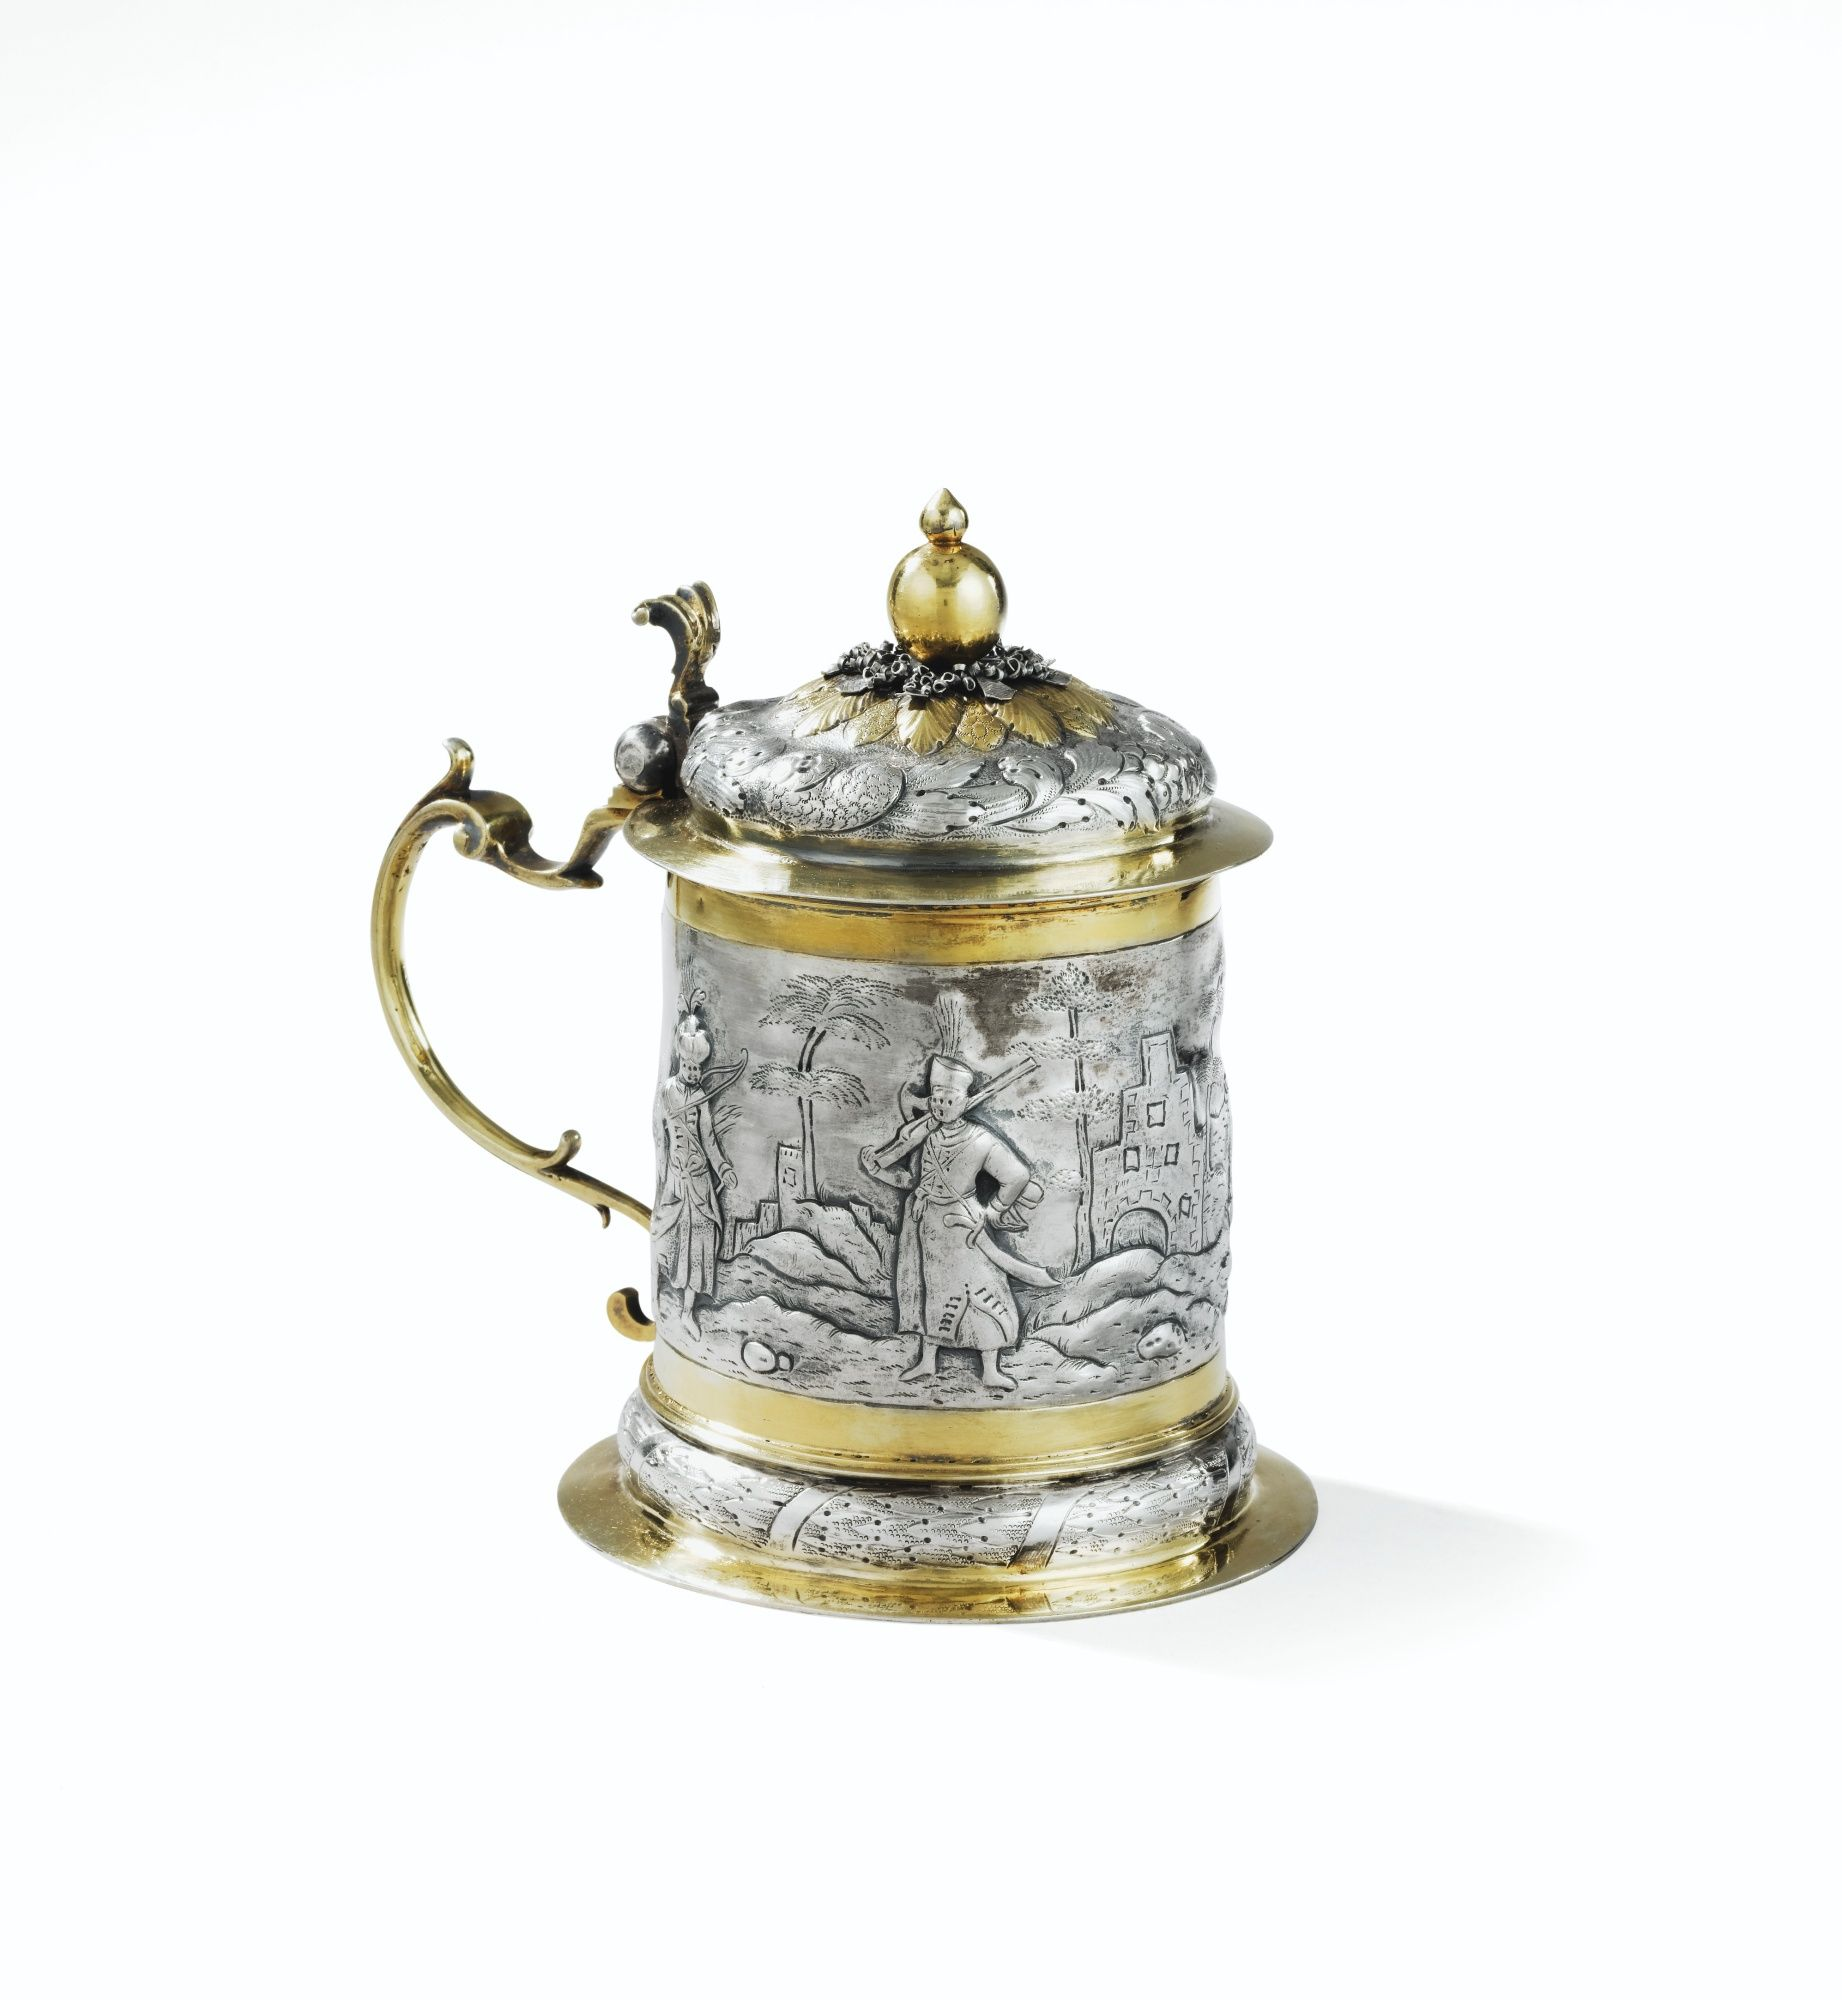 A PARCEL-GILT SILVER TANKARD, PROBABLY GERMANY, CIRCA 1680